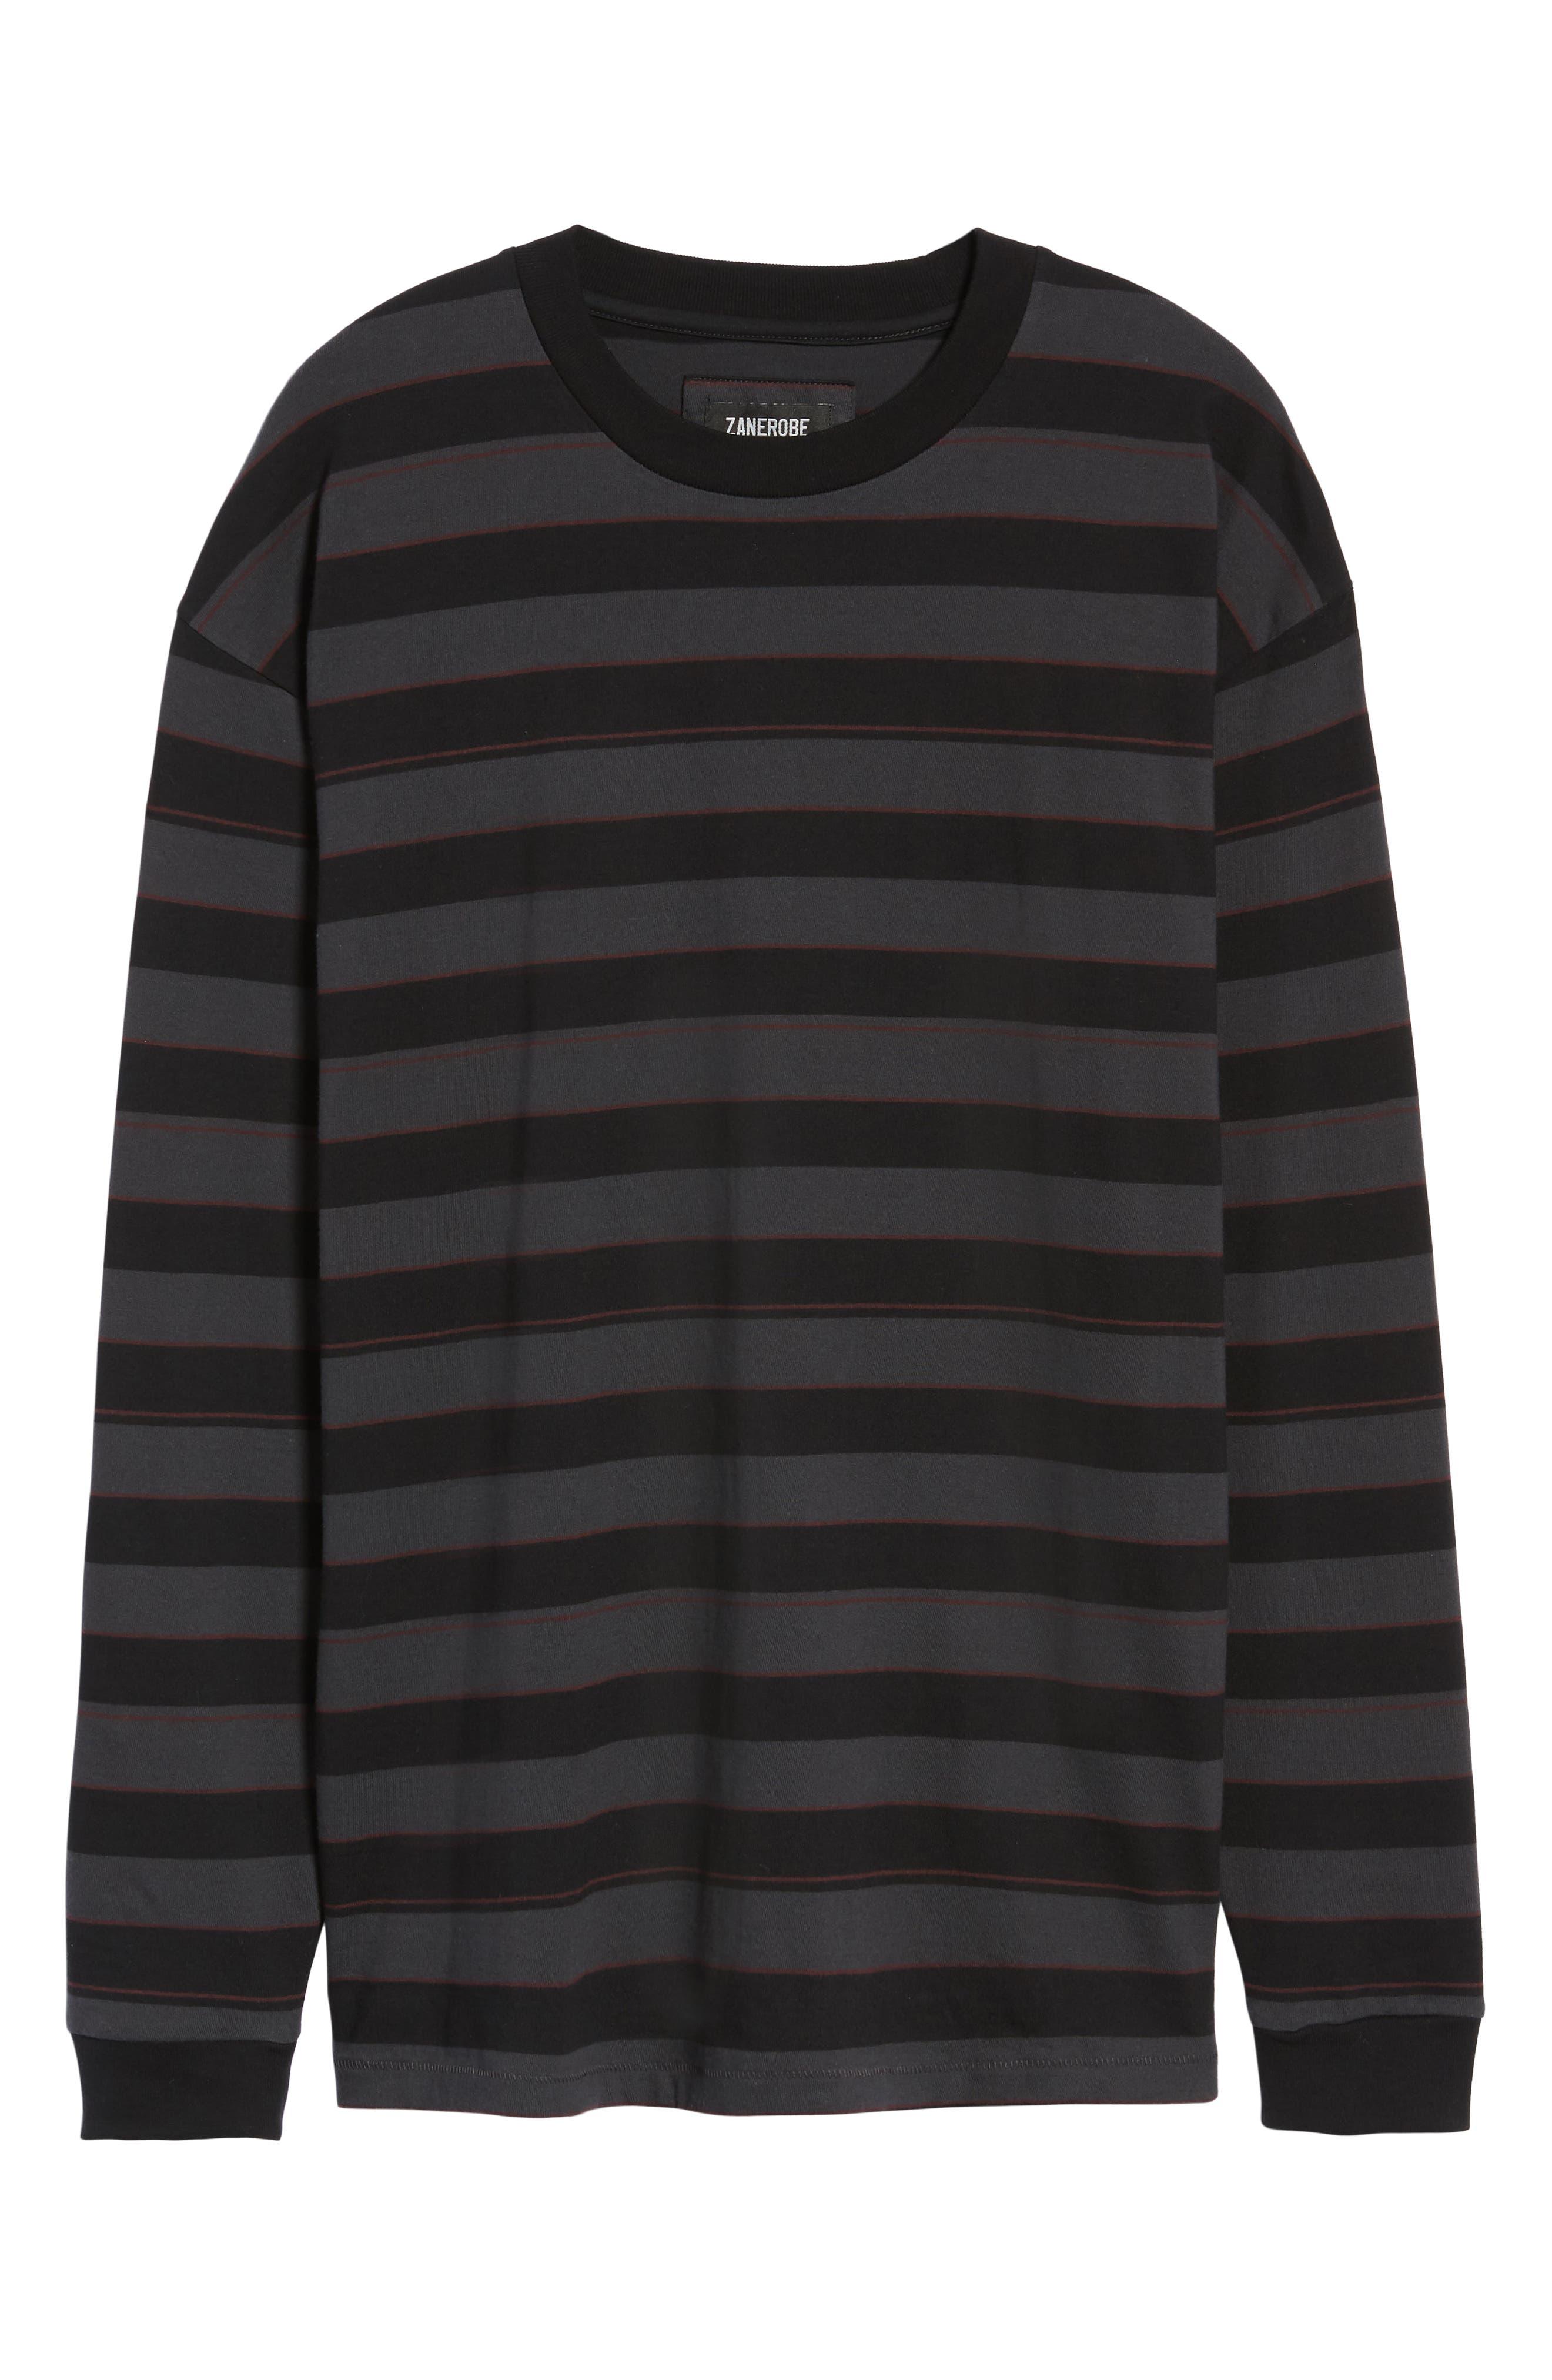 Hoop Box Long Sleeve T-Shirt,                             Alternate thumbnail 6, color,                             VINTAGE BLACK/ BLACK